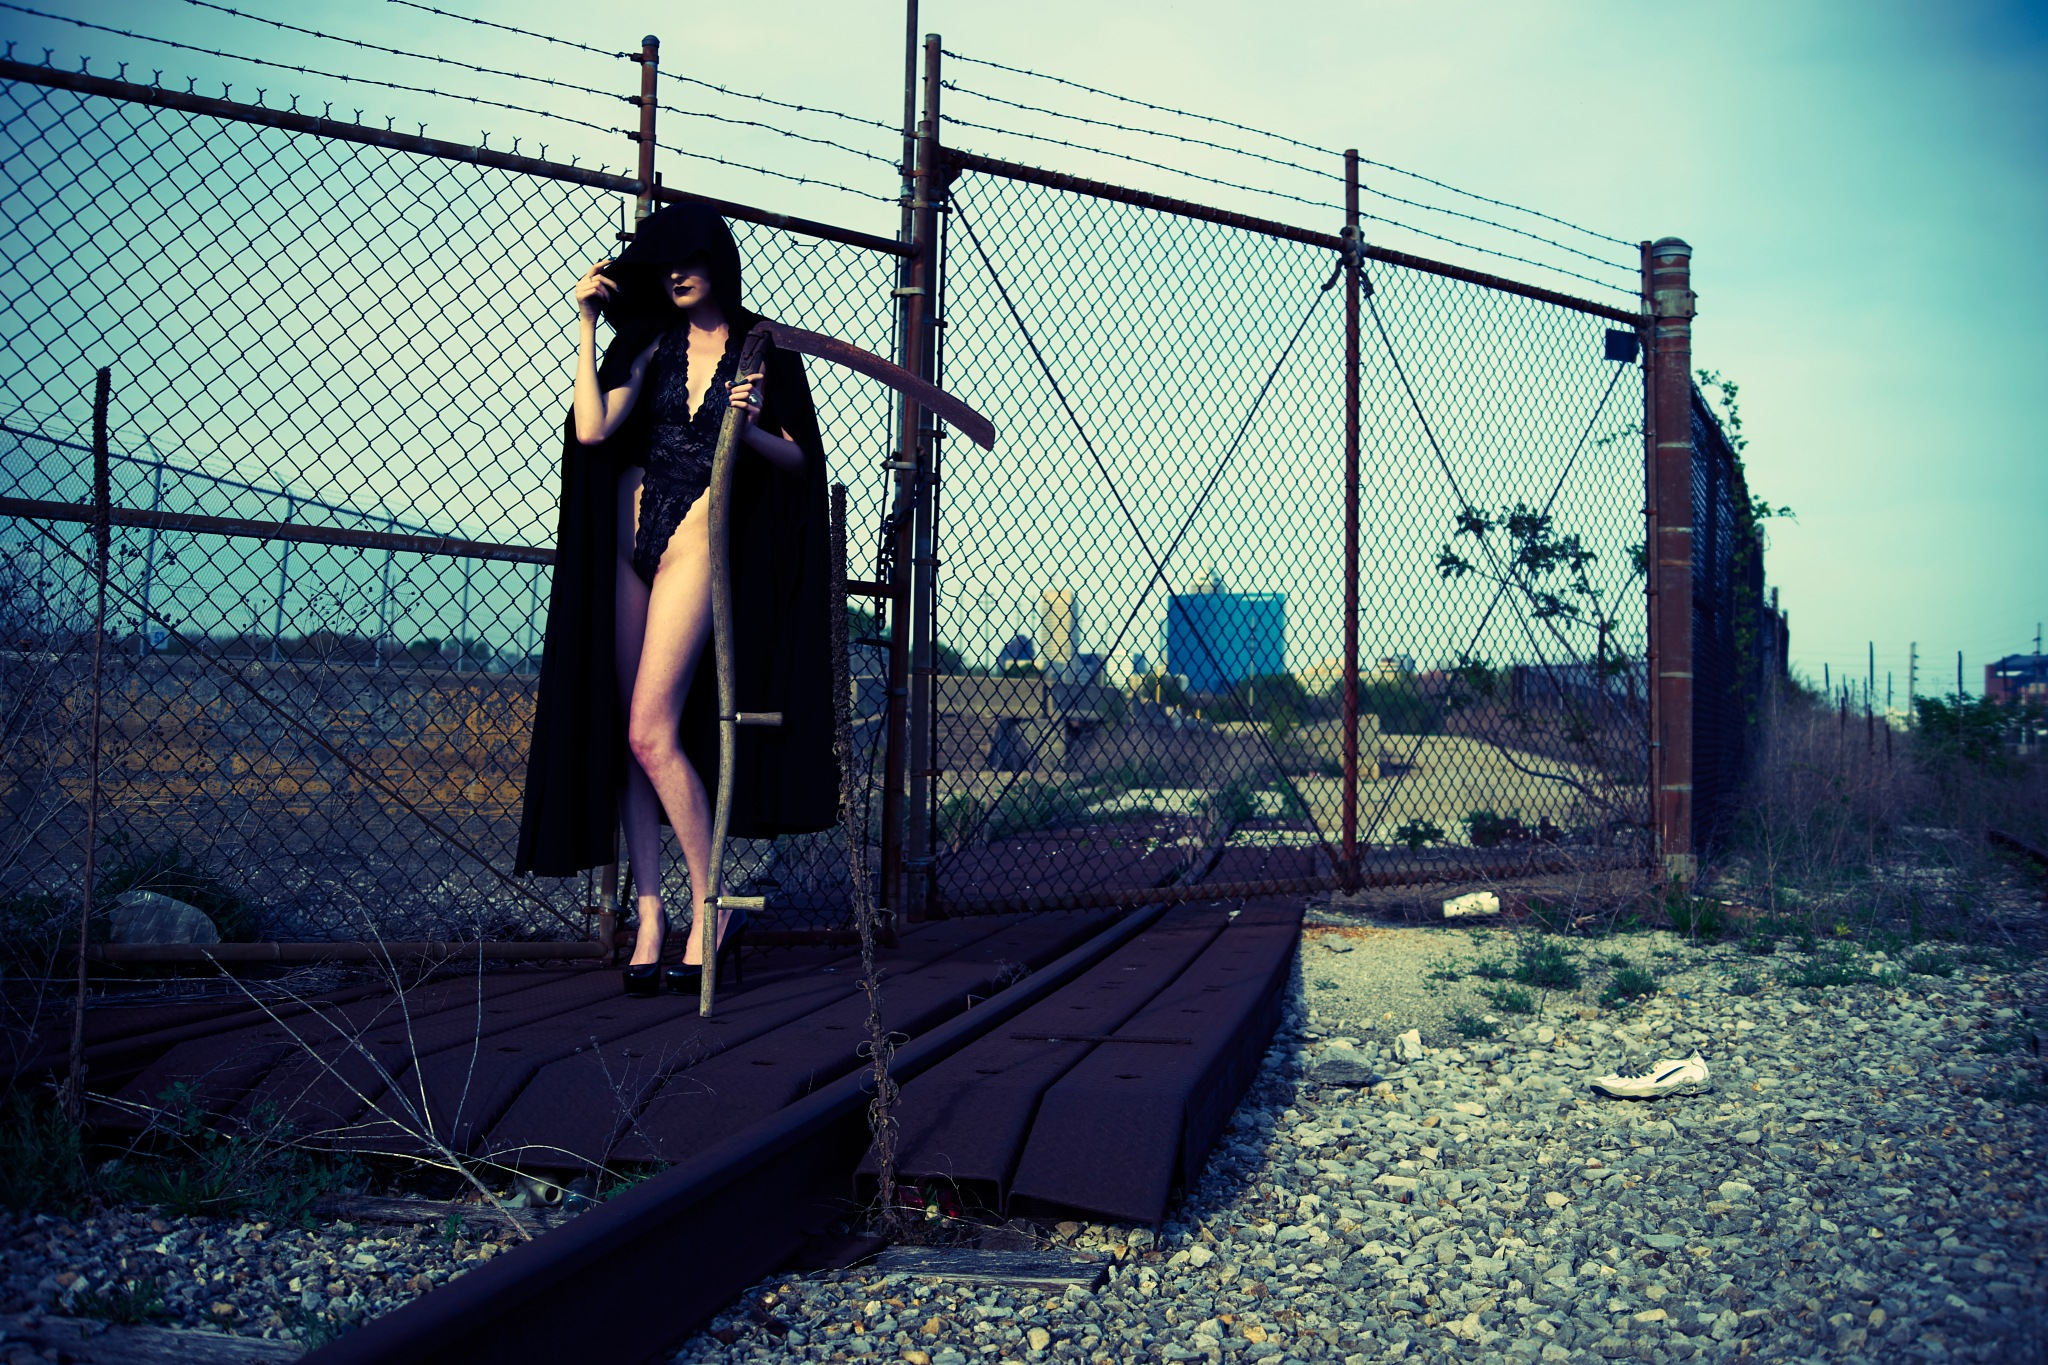 Grim City by Frankie Cochran